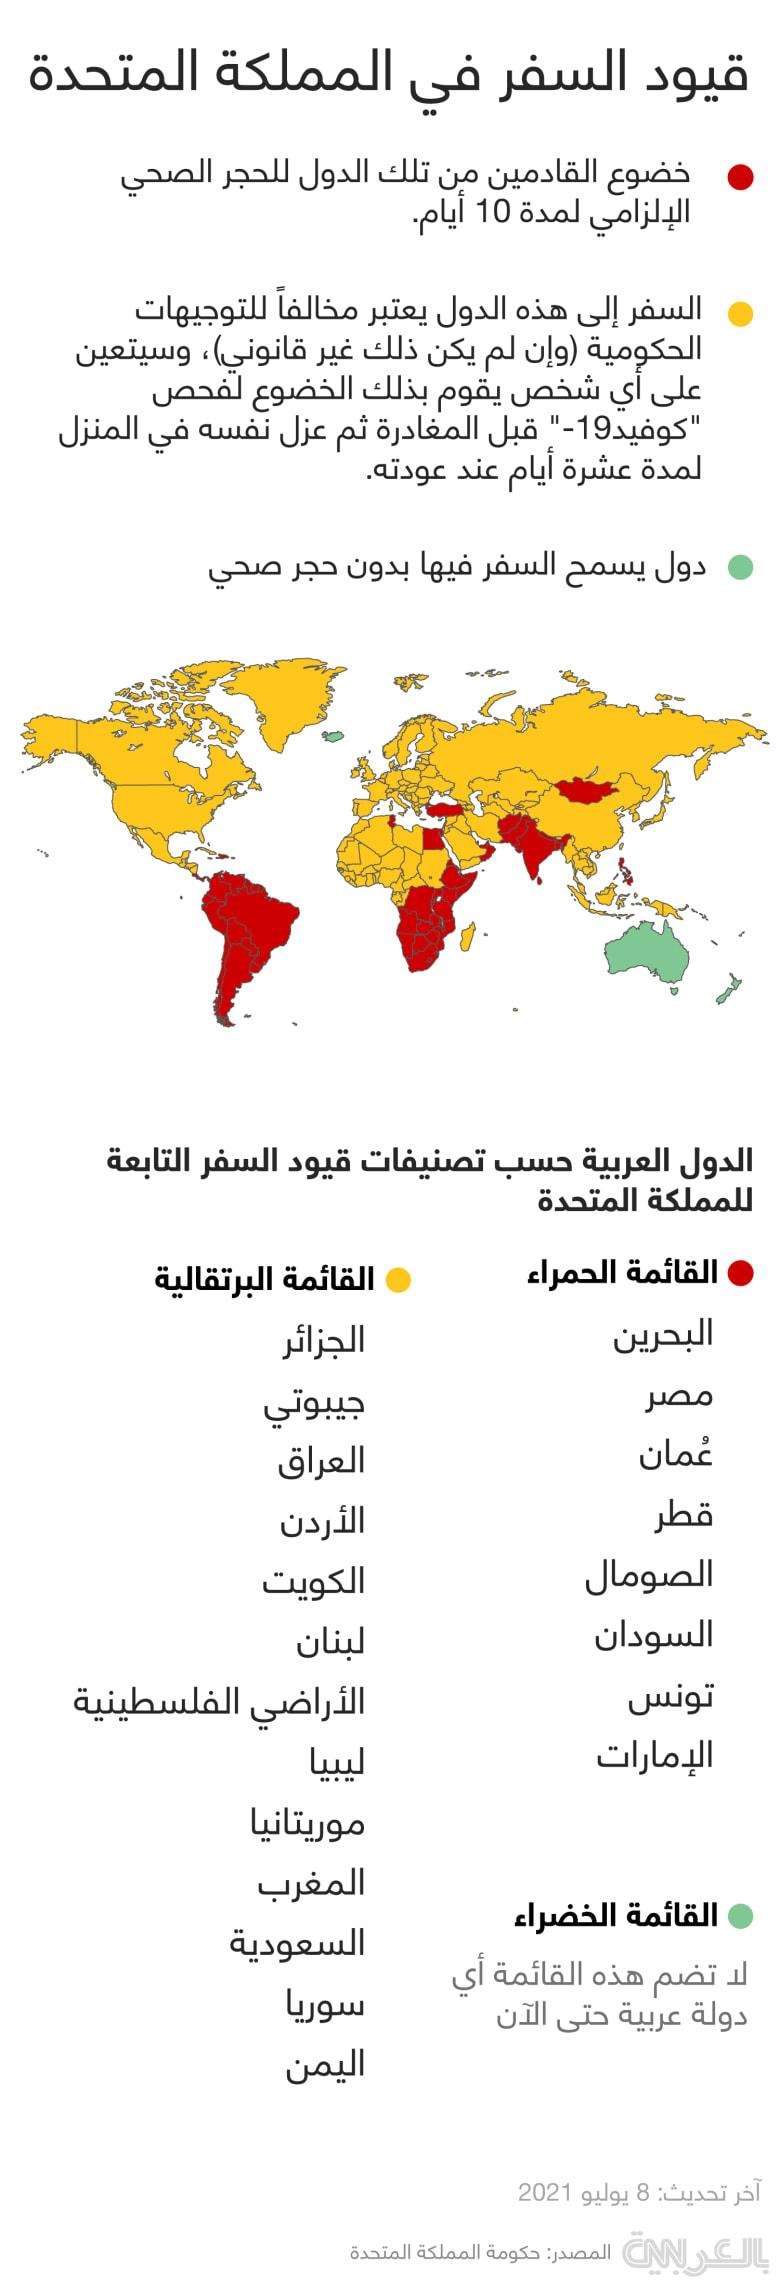 arab-countries-UK-travel-ban-list